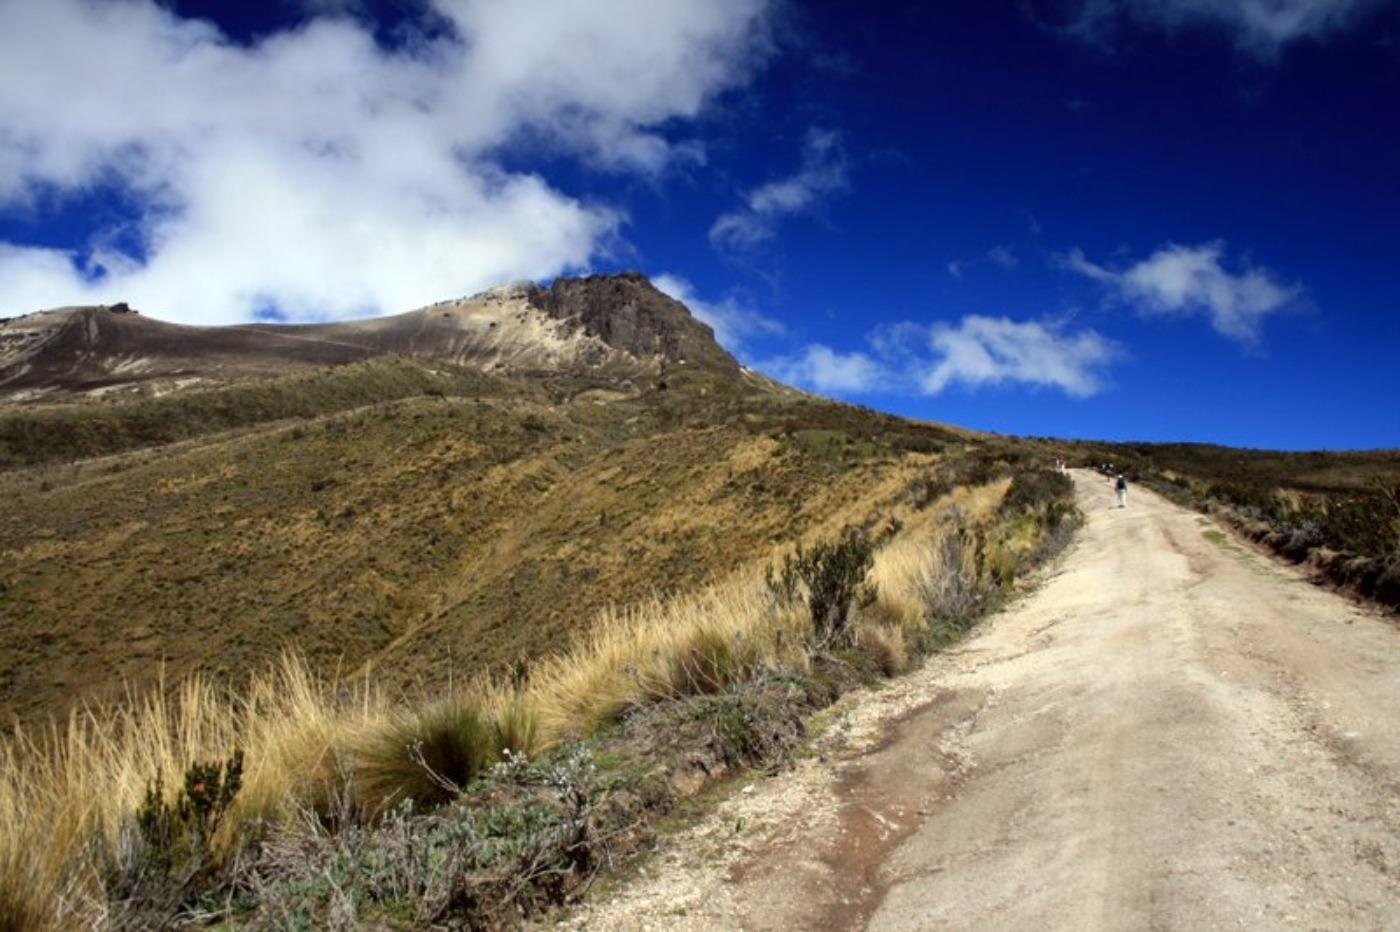 Sentier du volcan guagua pichincha